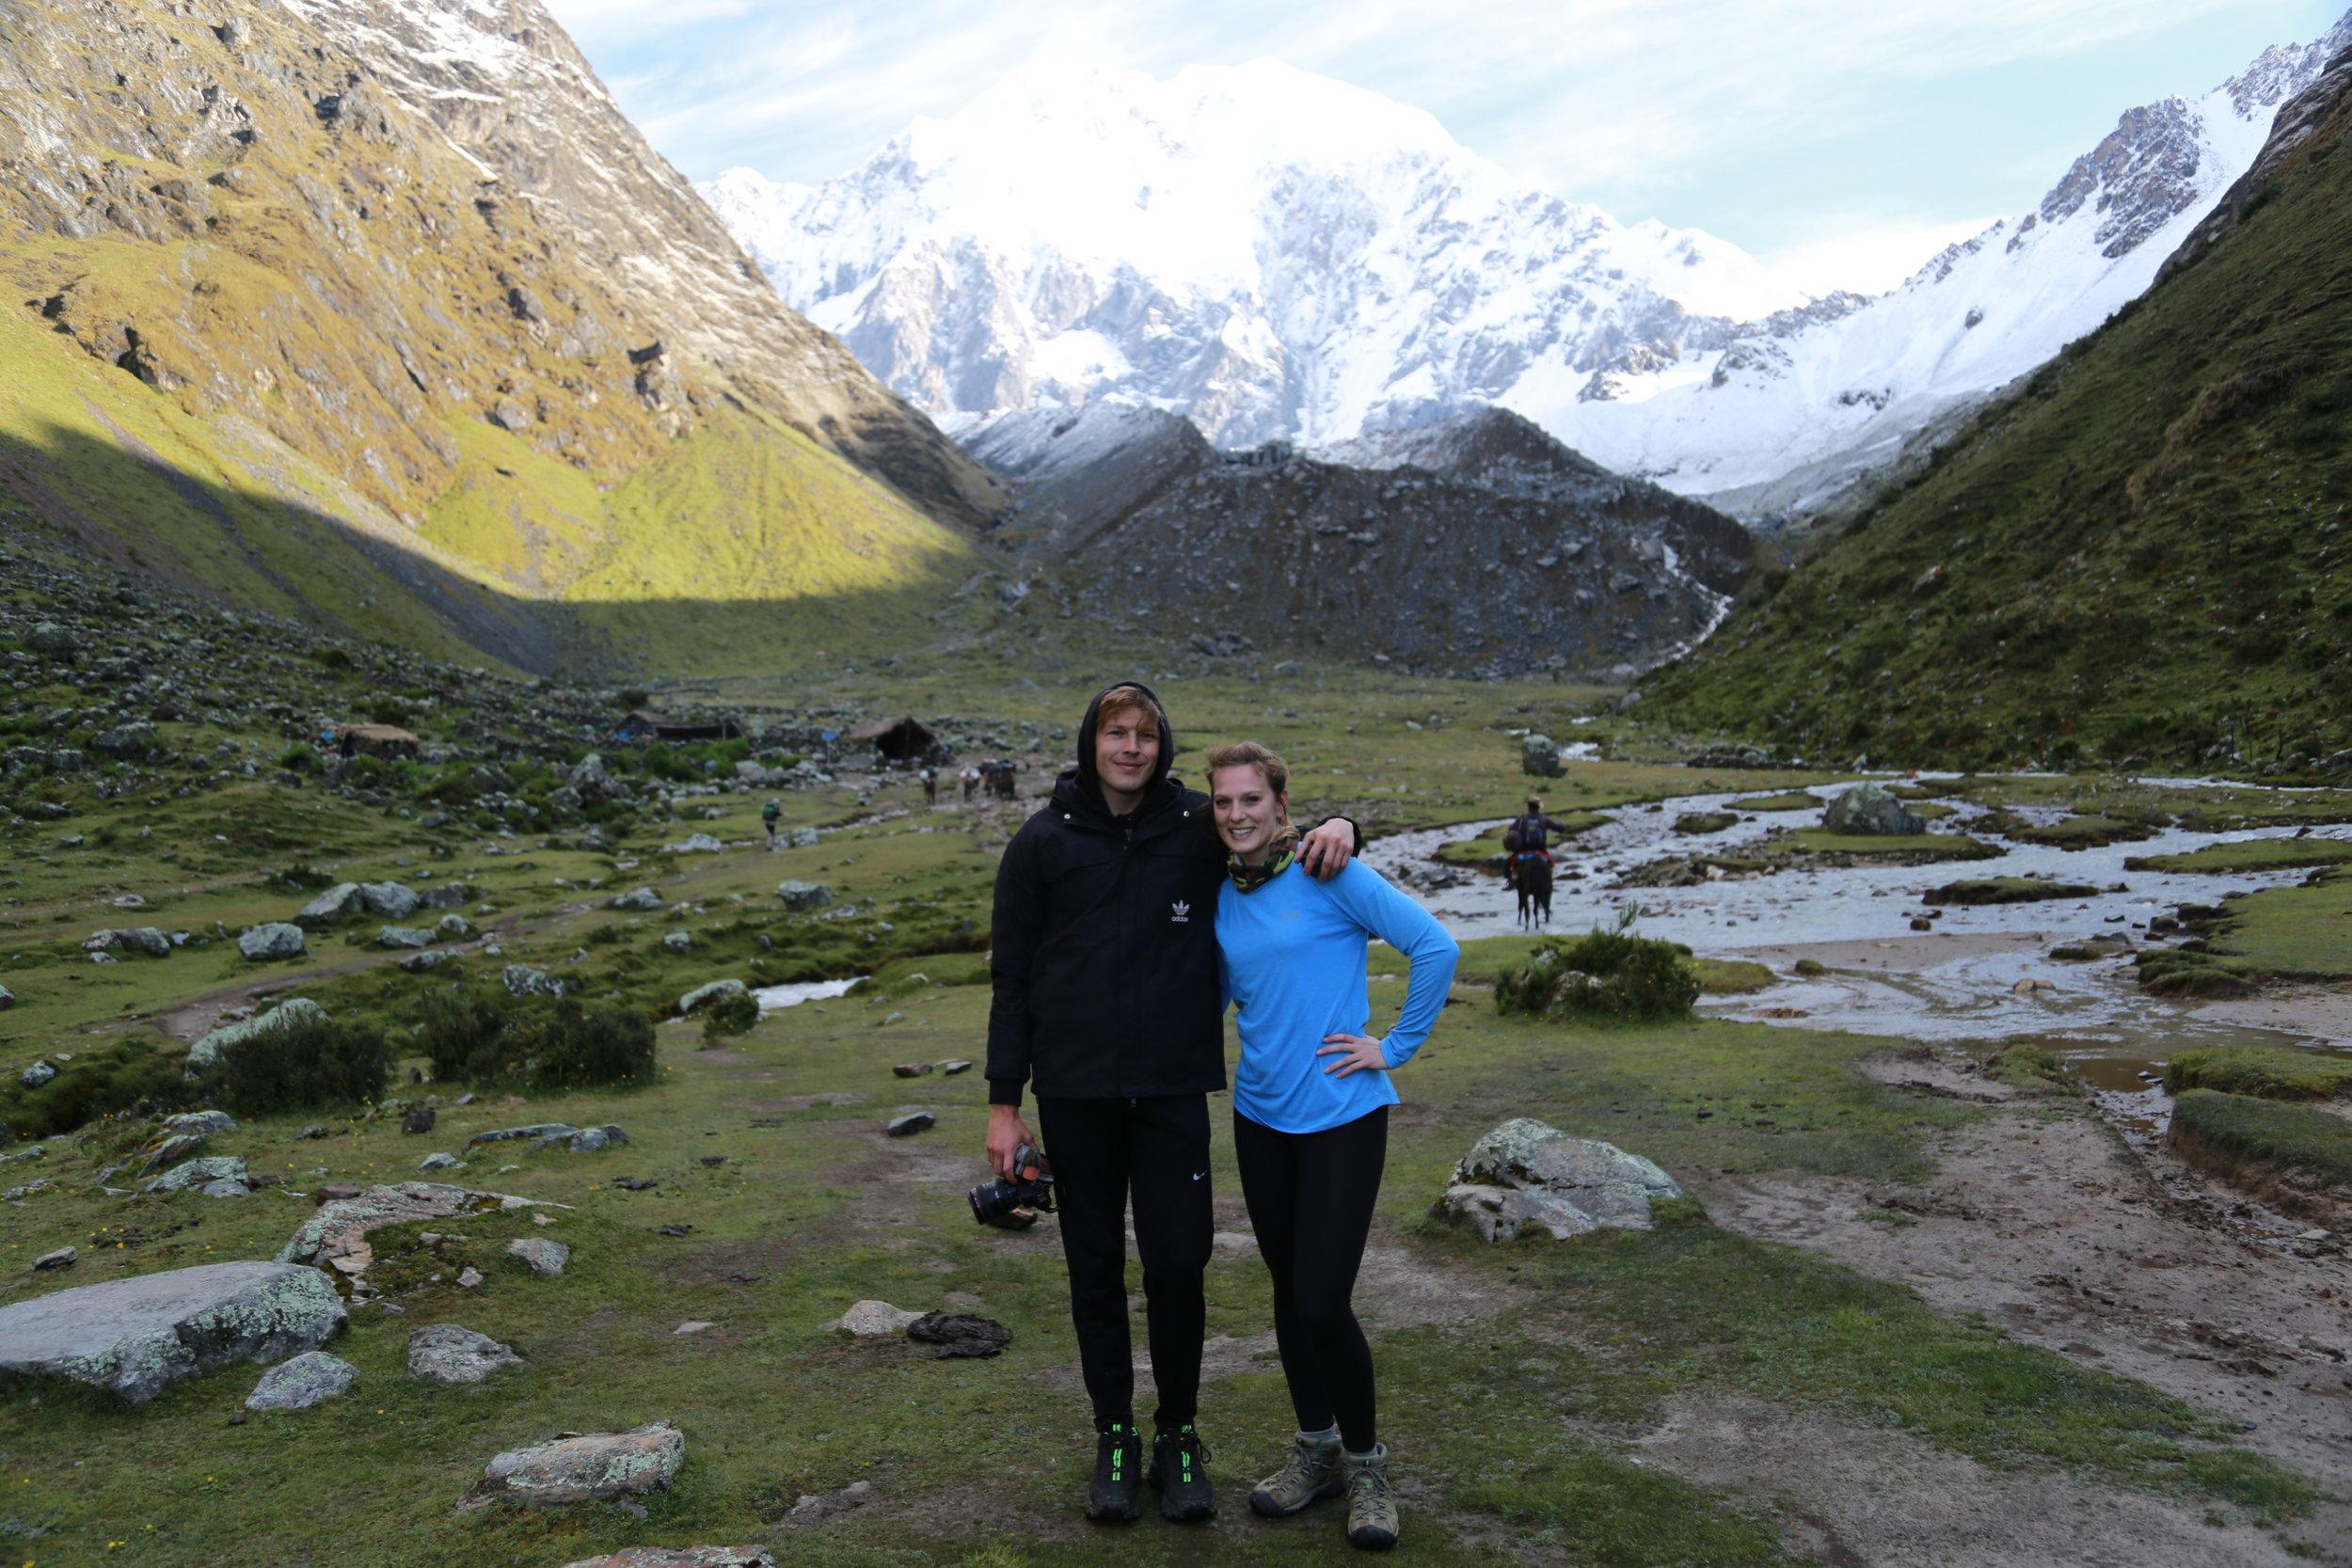 Standing in front of Salkantay Glacier during the Salkantay Trek to Machu Picchu.